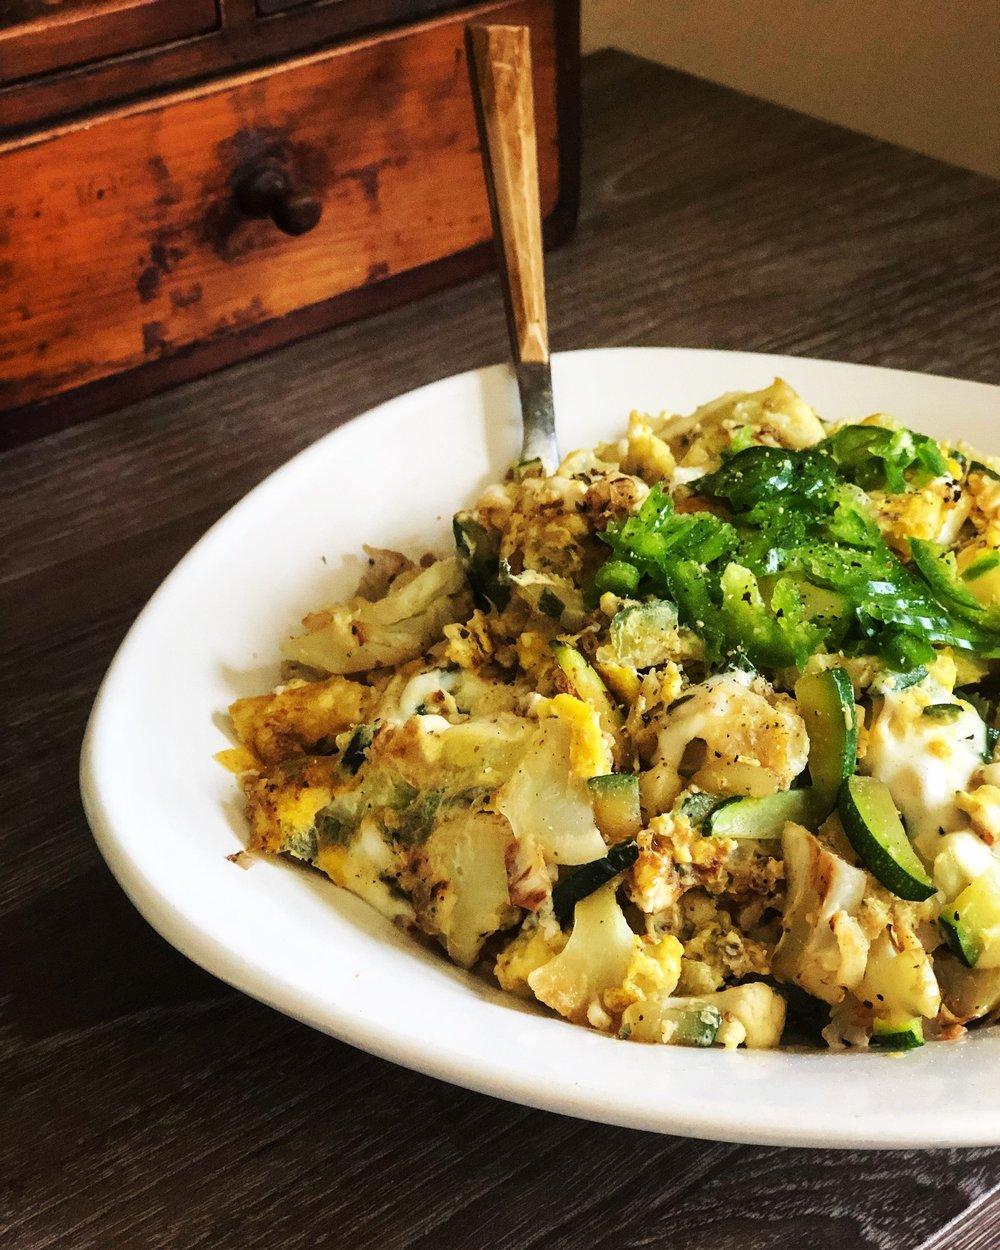 Cauliflower has with zucchini, eggs, mozzarella, sage, and jalapeño.